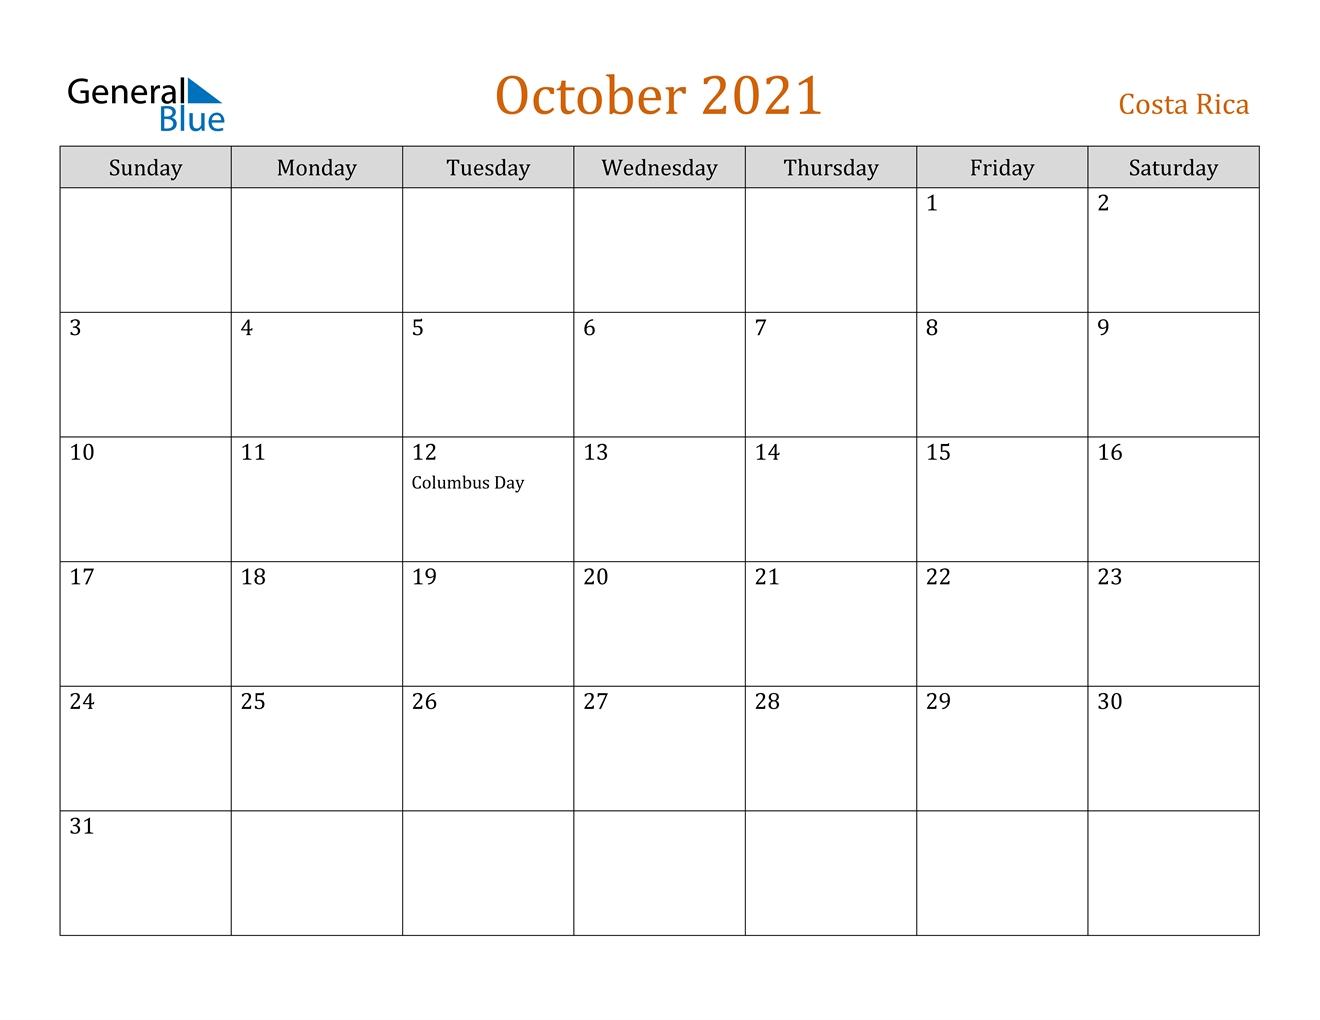 October 2021 Calendar - Costa Rica